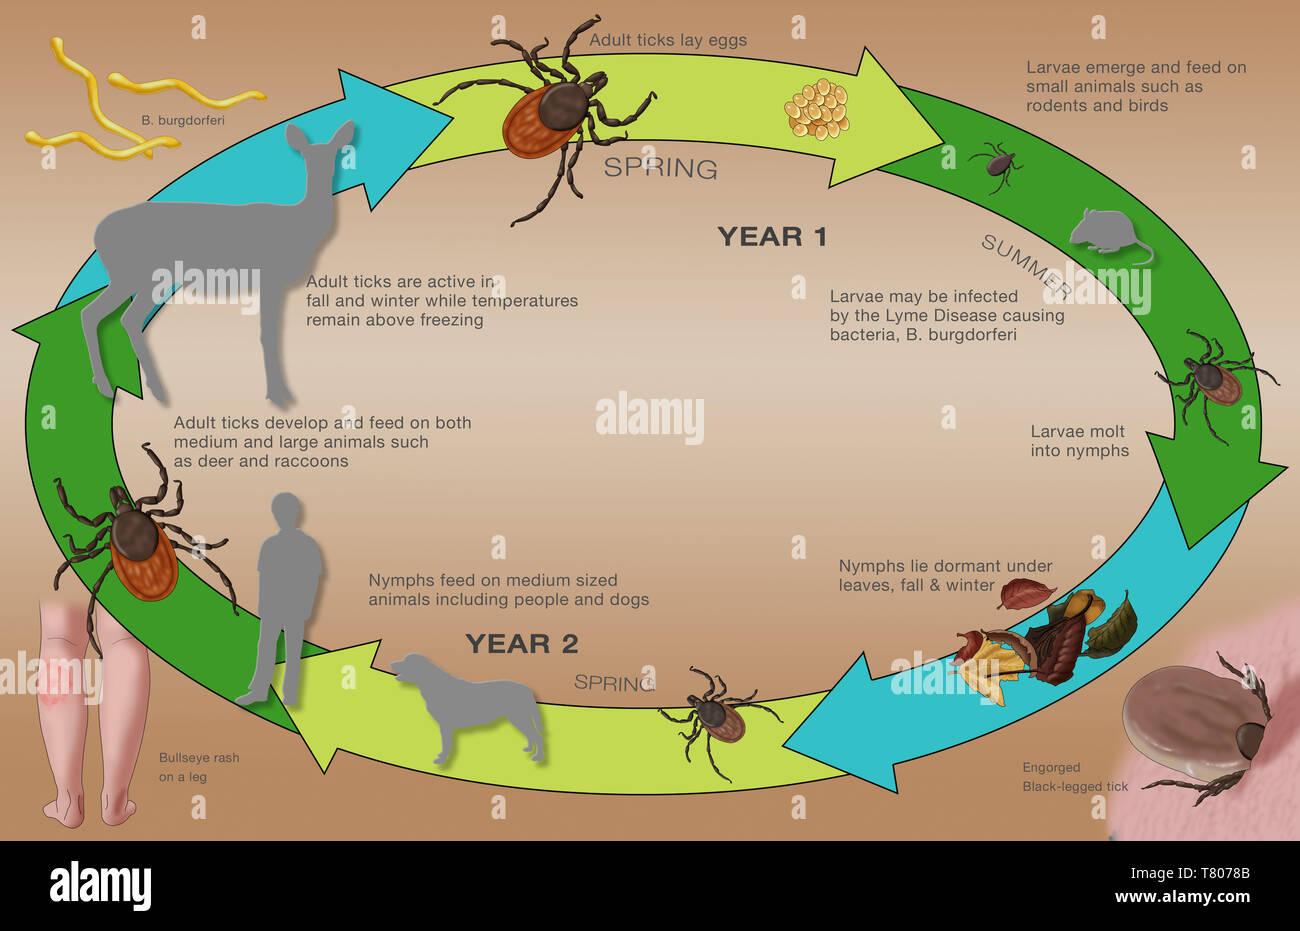 Life Cycle of the Black-legged Tick & Lyme, Illustration - Stock Image